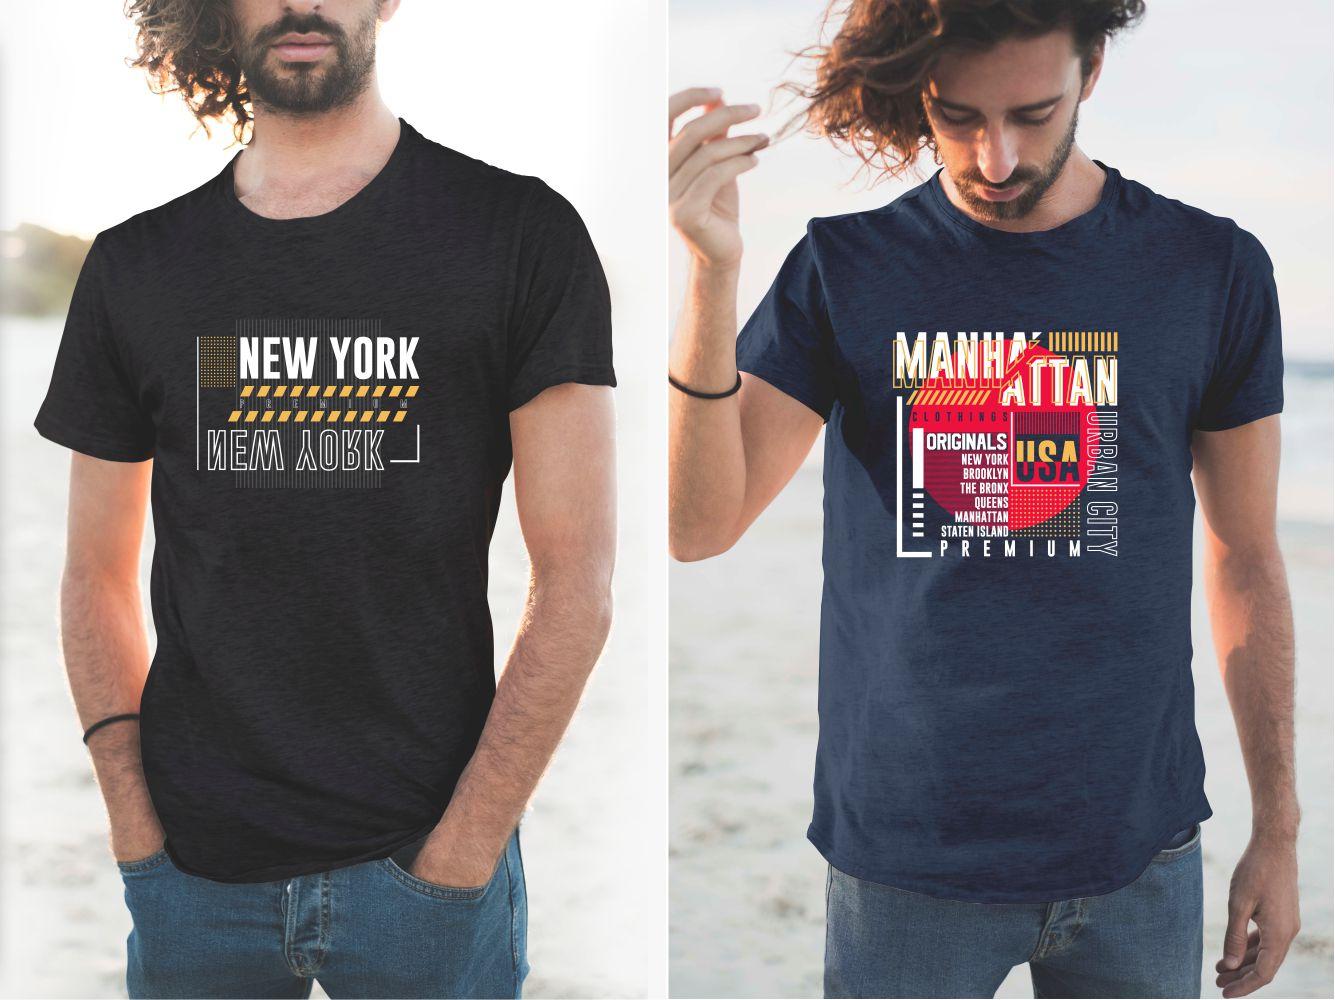 106 Urban T-shirt Designs Collection - 20 1